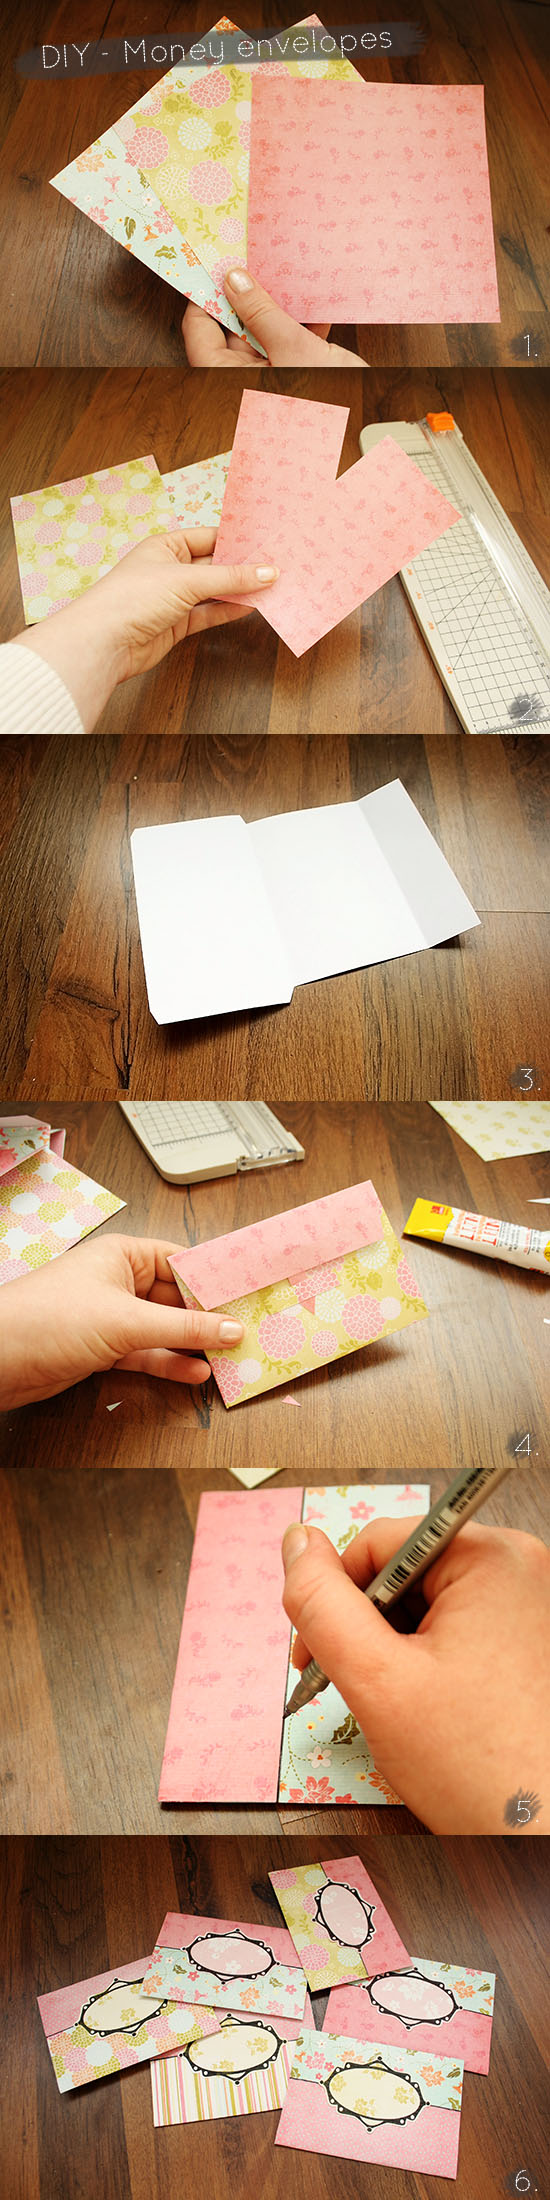 DIY - Money envelopes